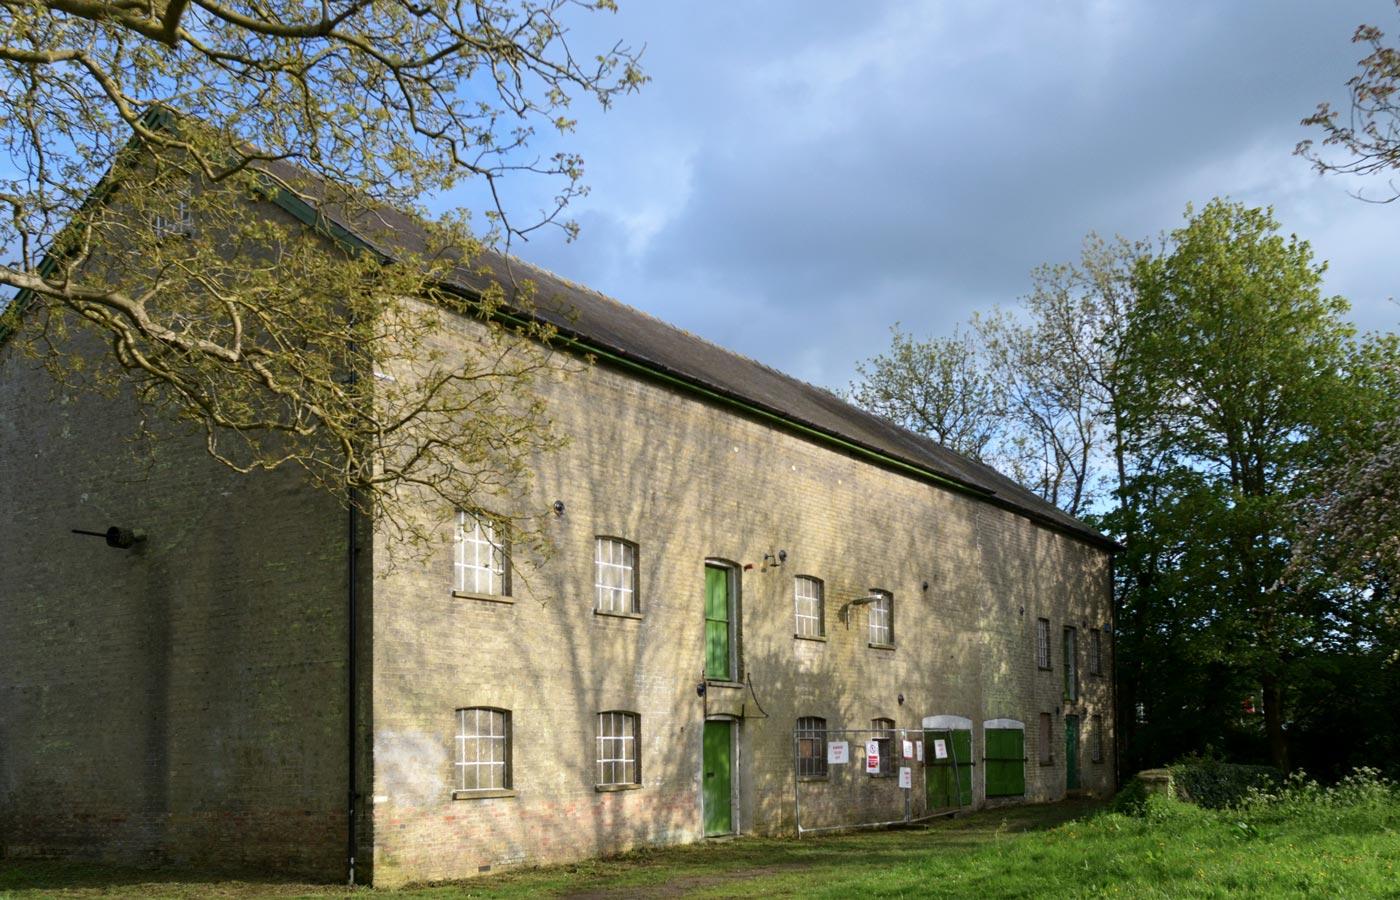 hauxton-mill-1a-1400